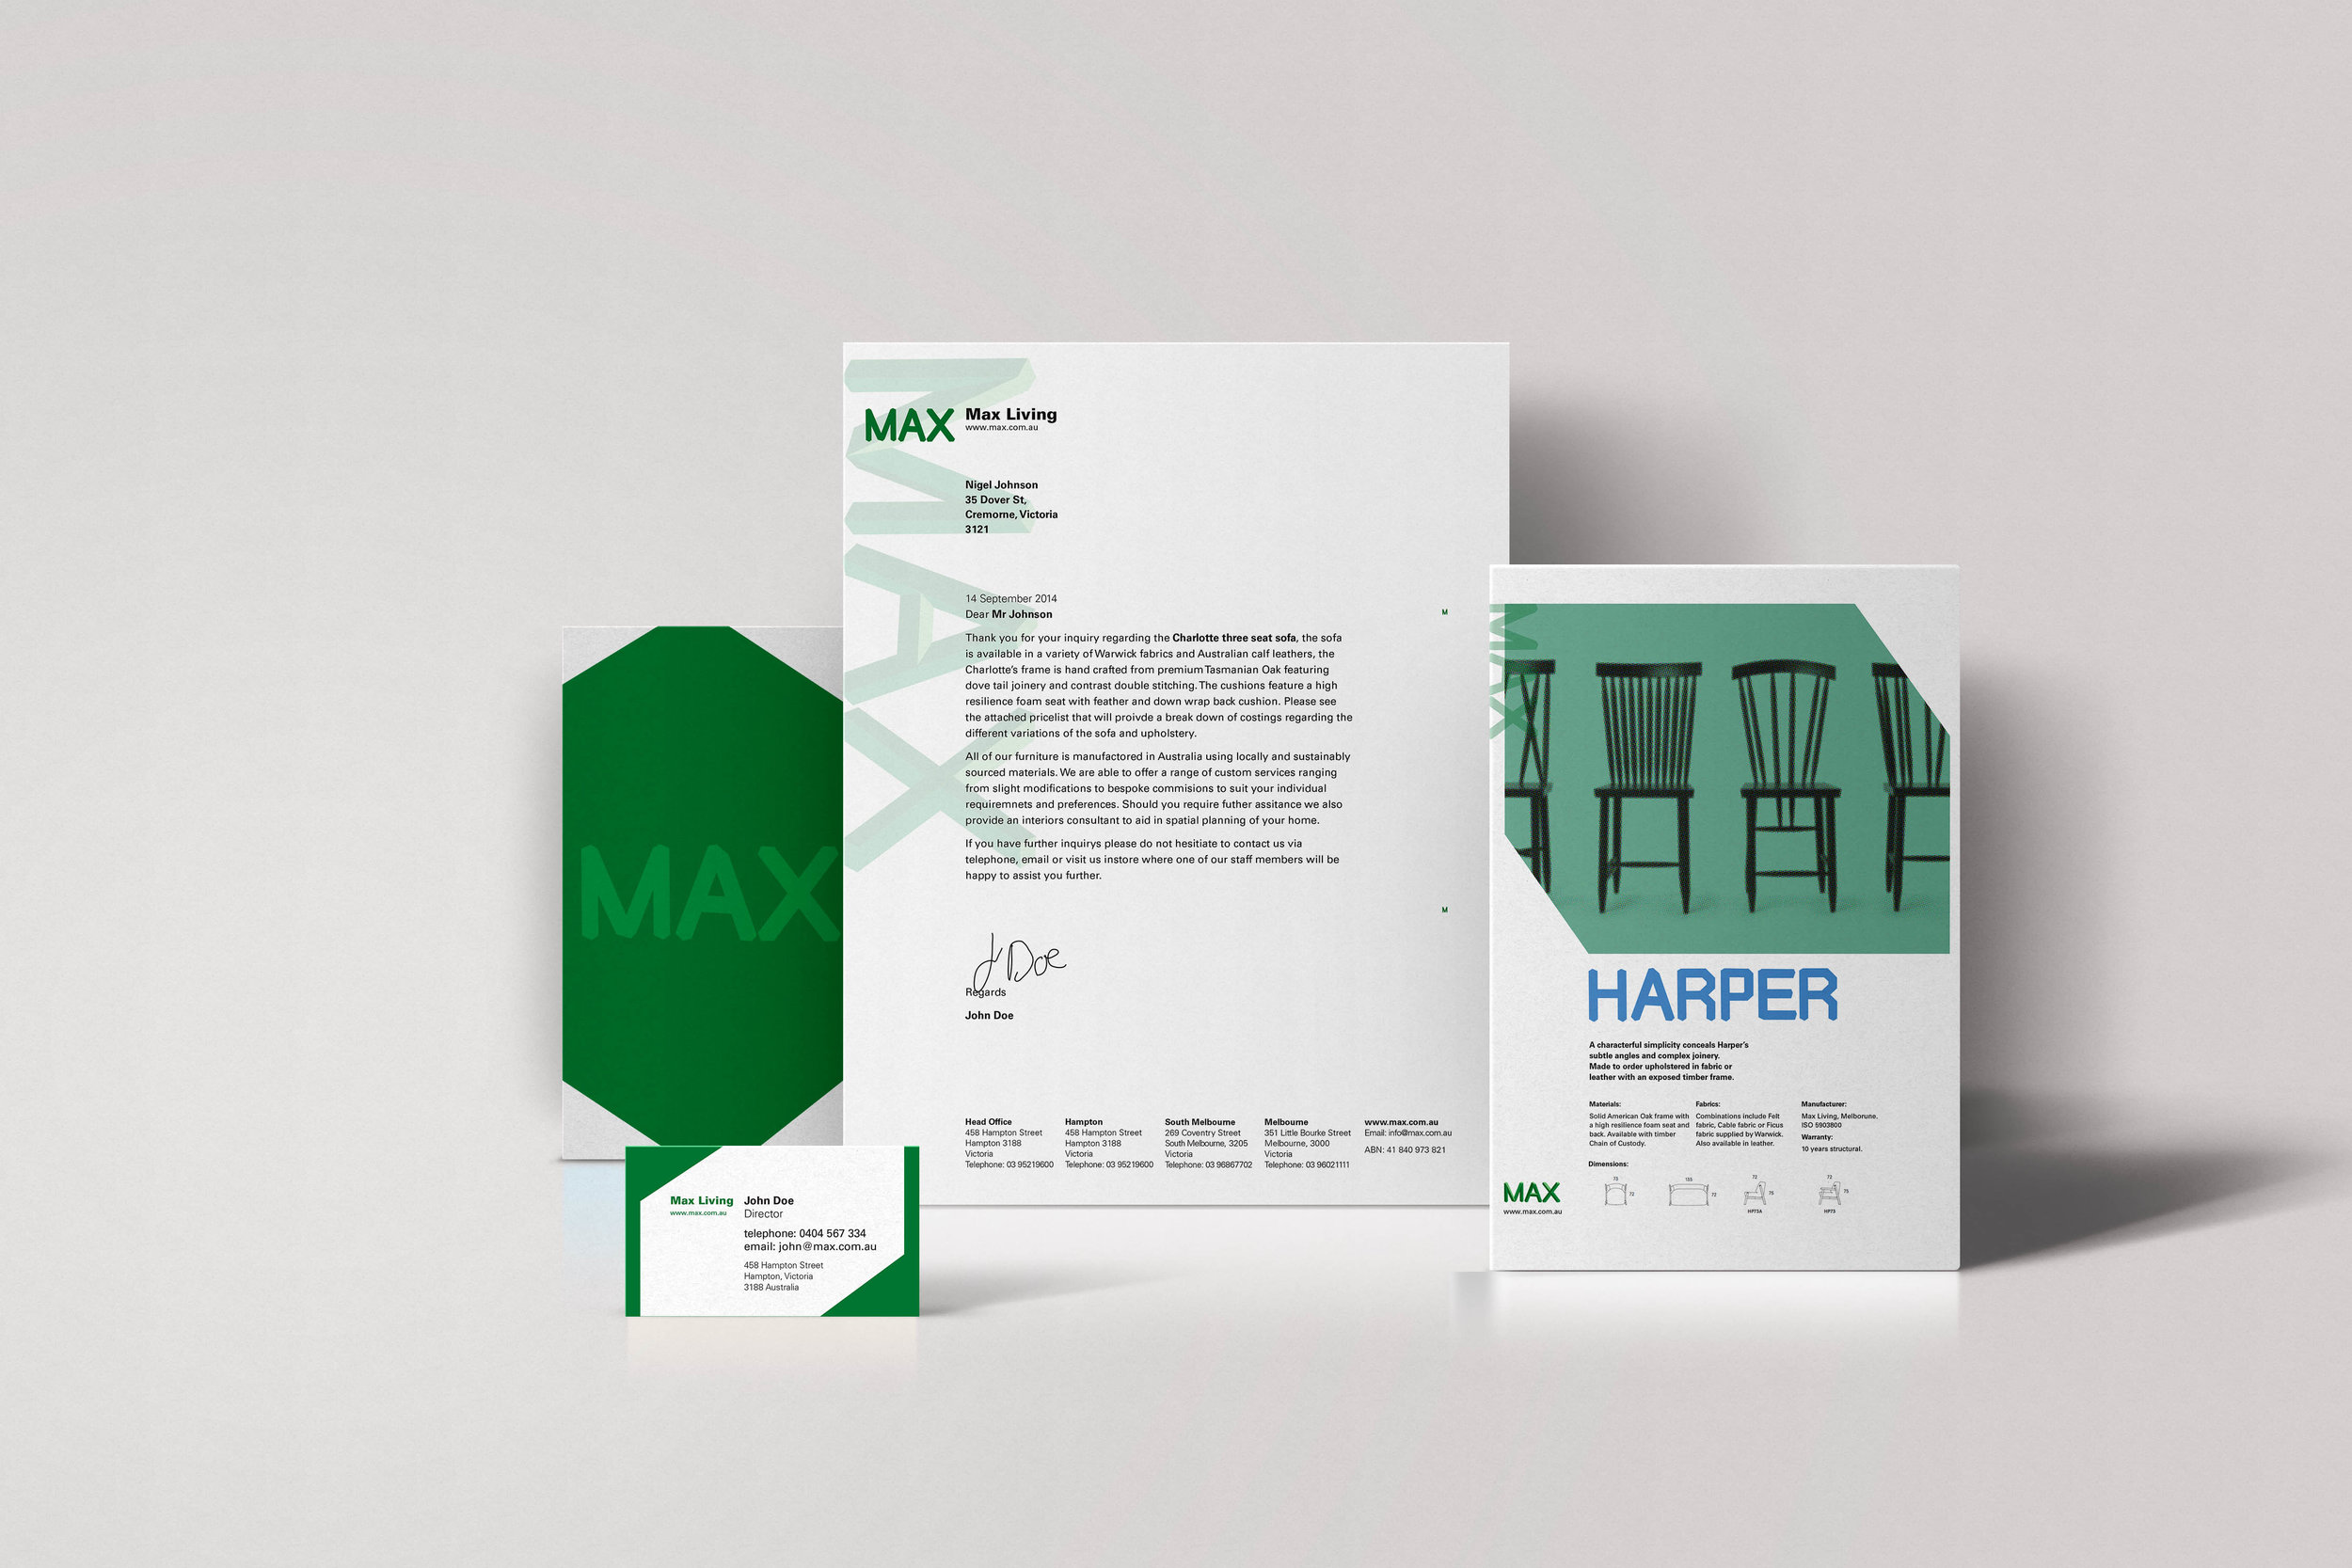 Paints-design-MAXStationery-Mockup.jpg